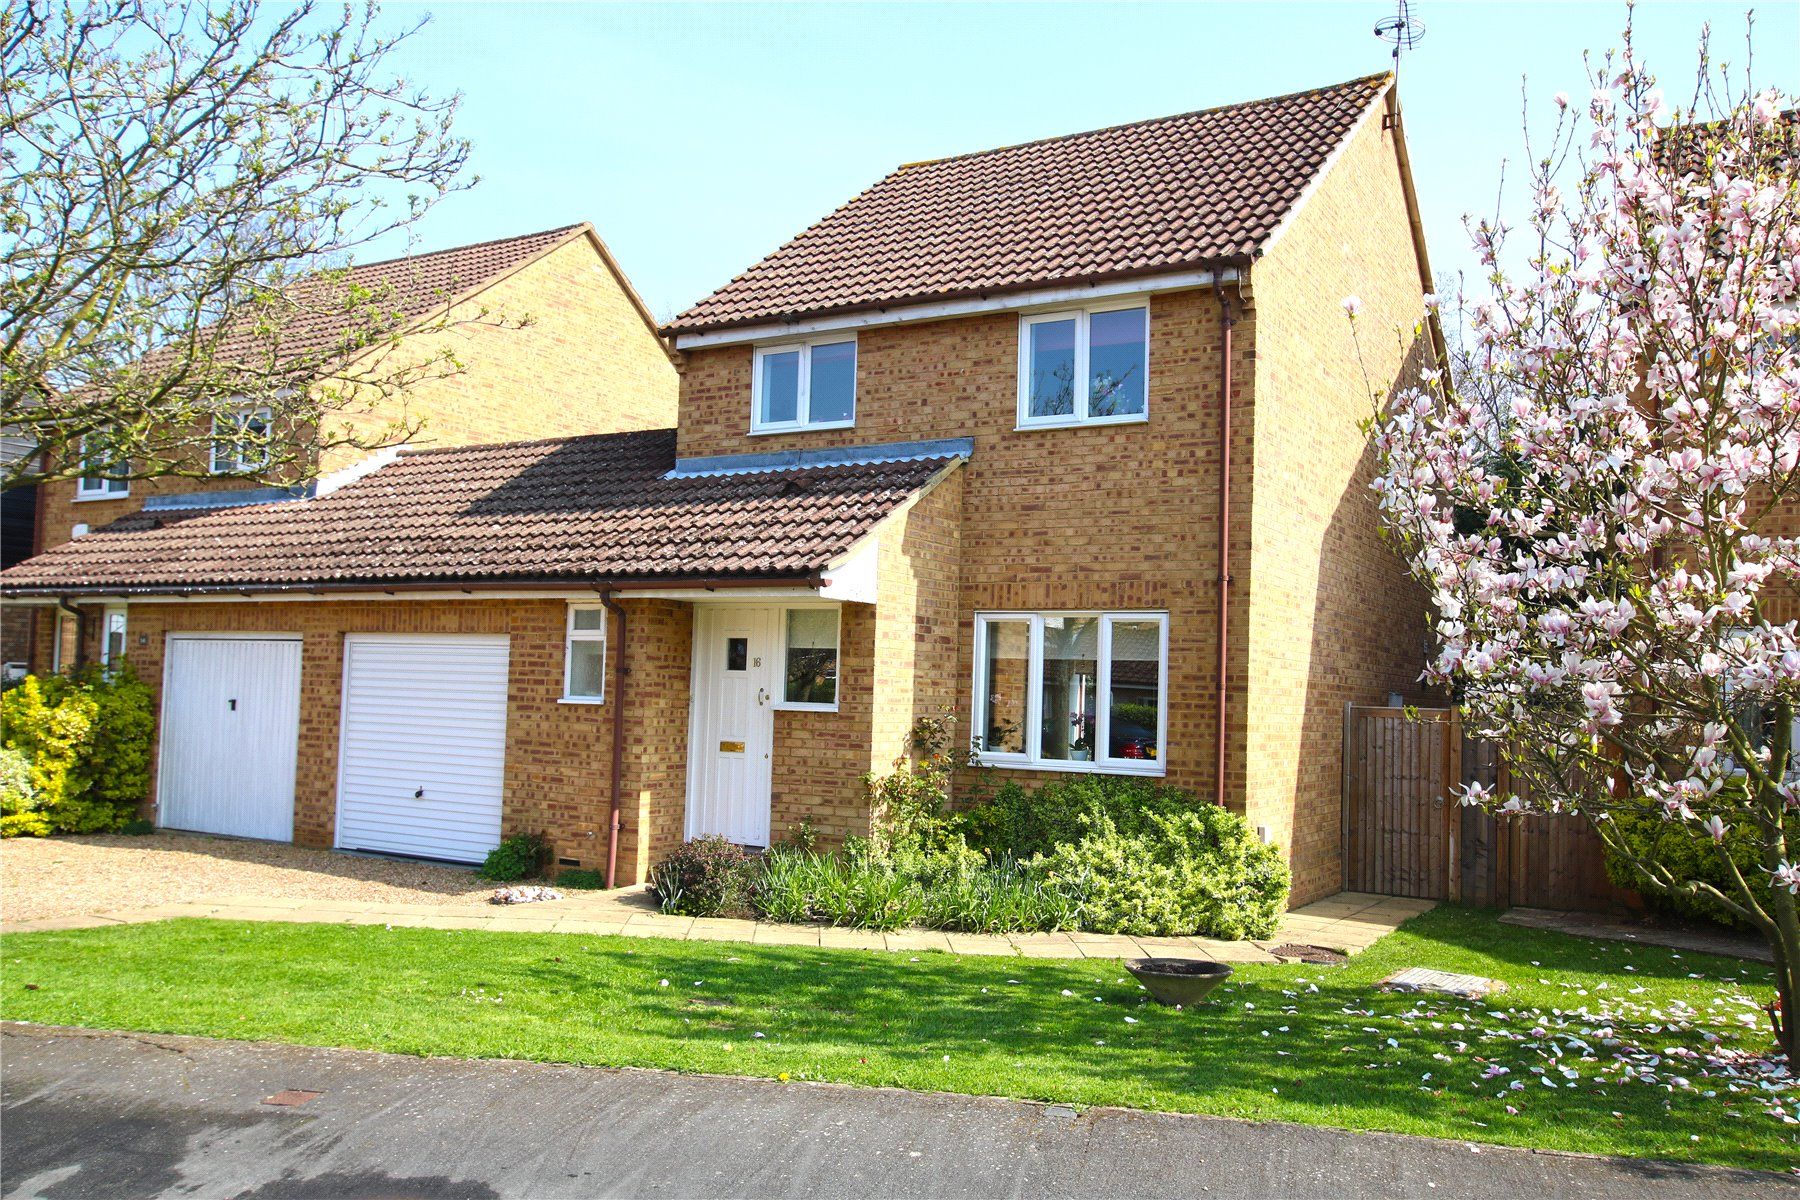 3 Bedroom Link Detached House For Sale In Surrey